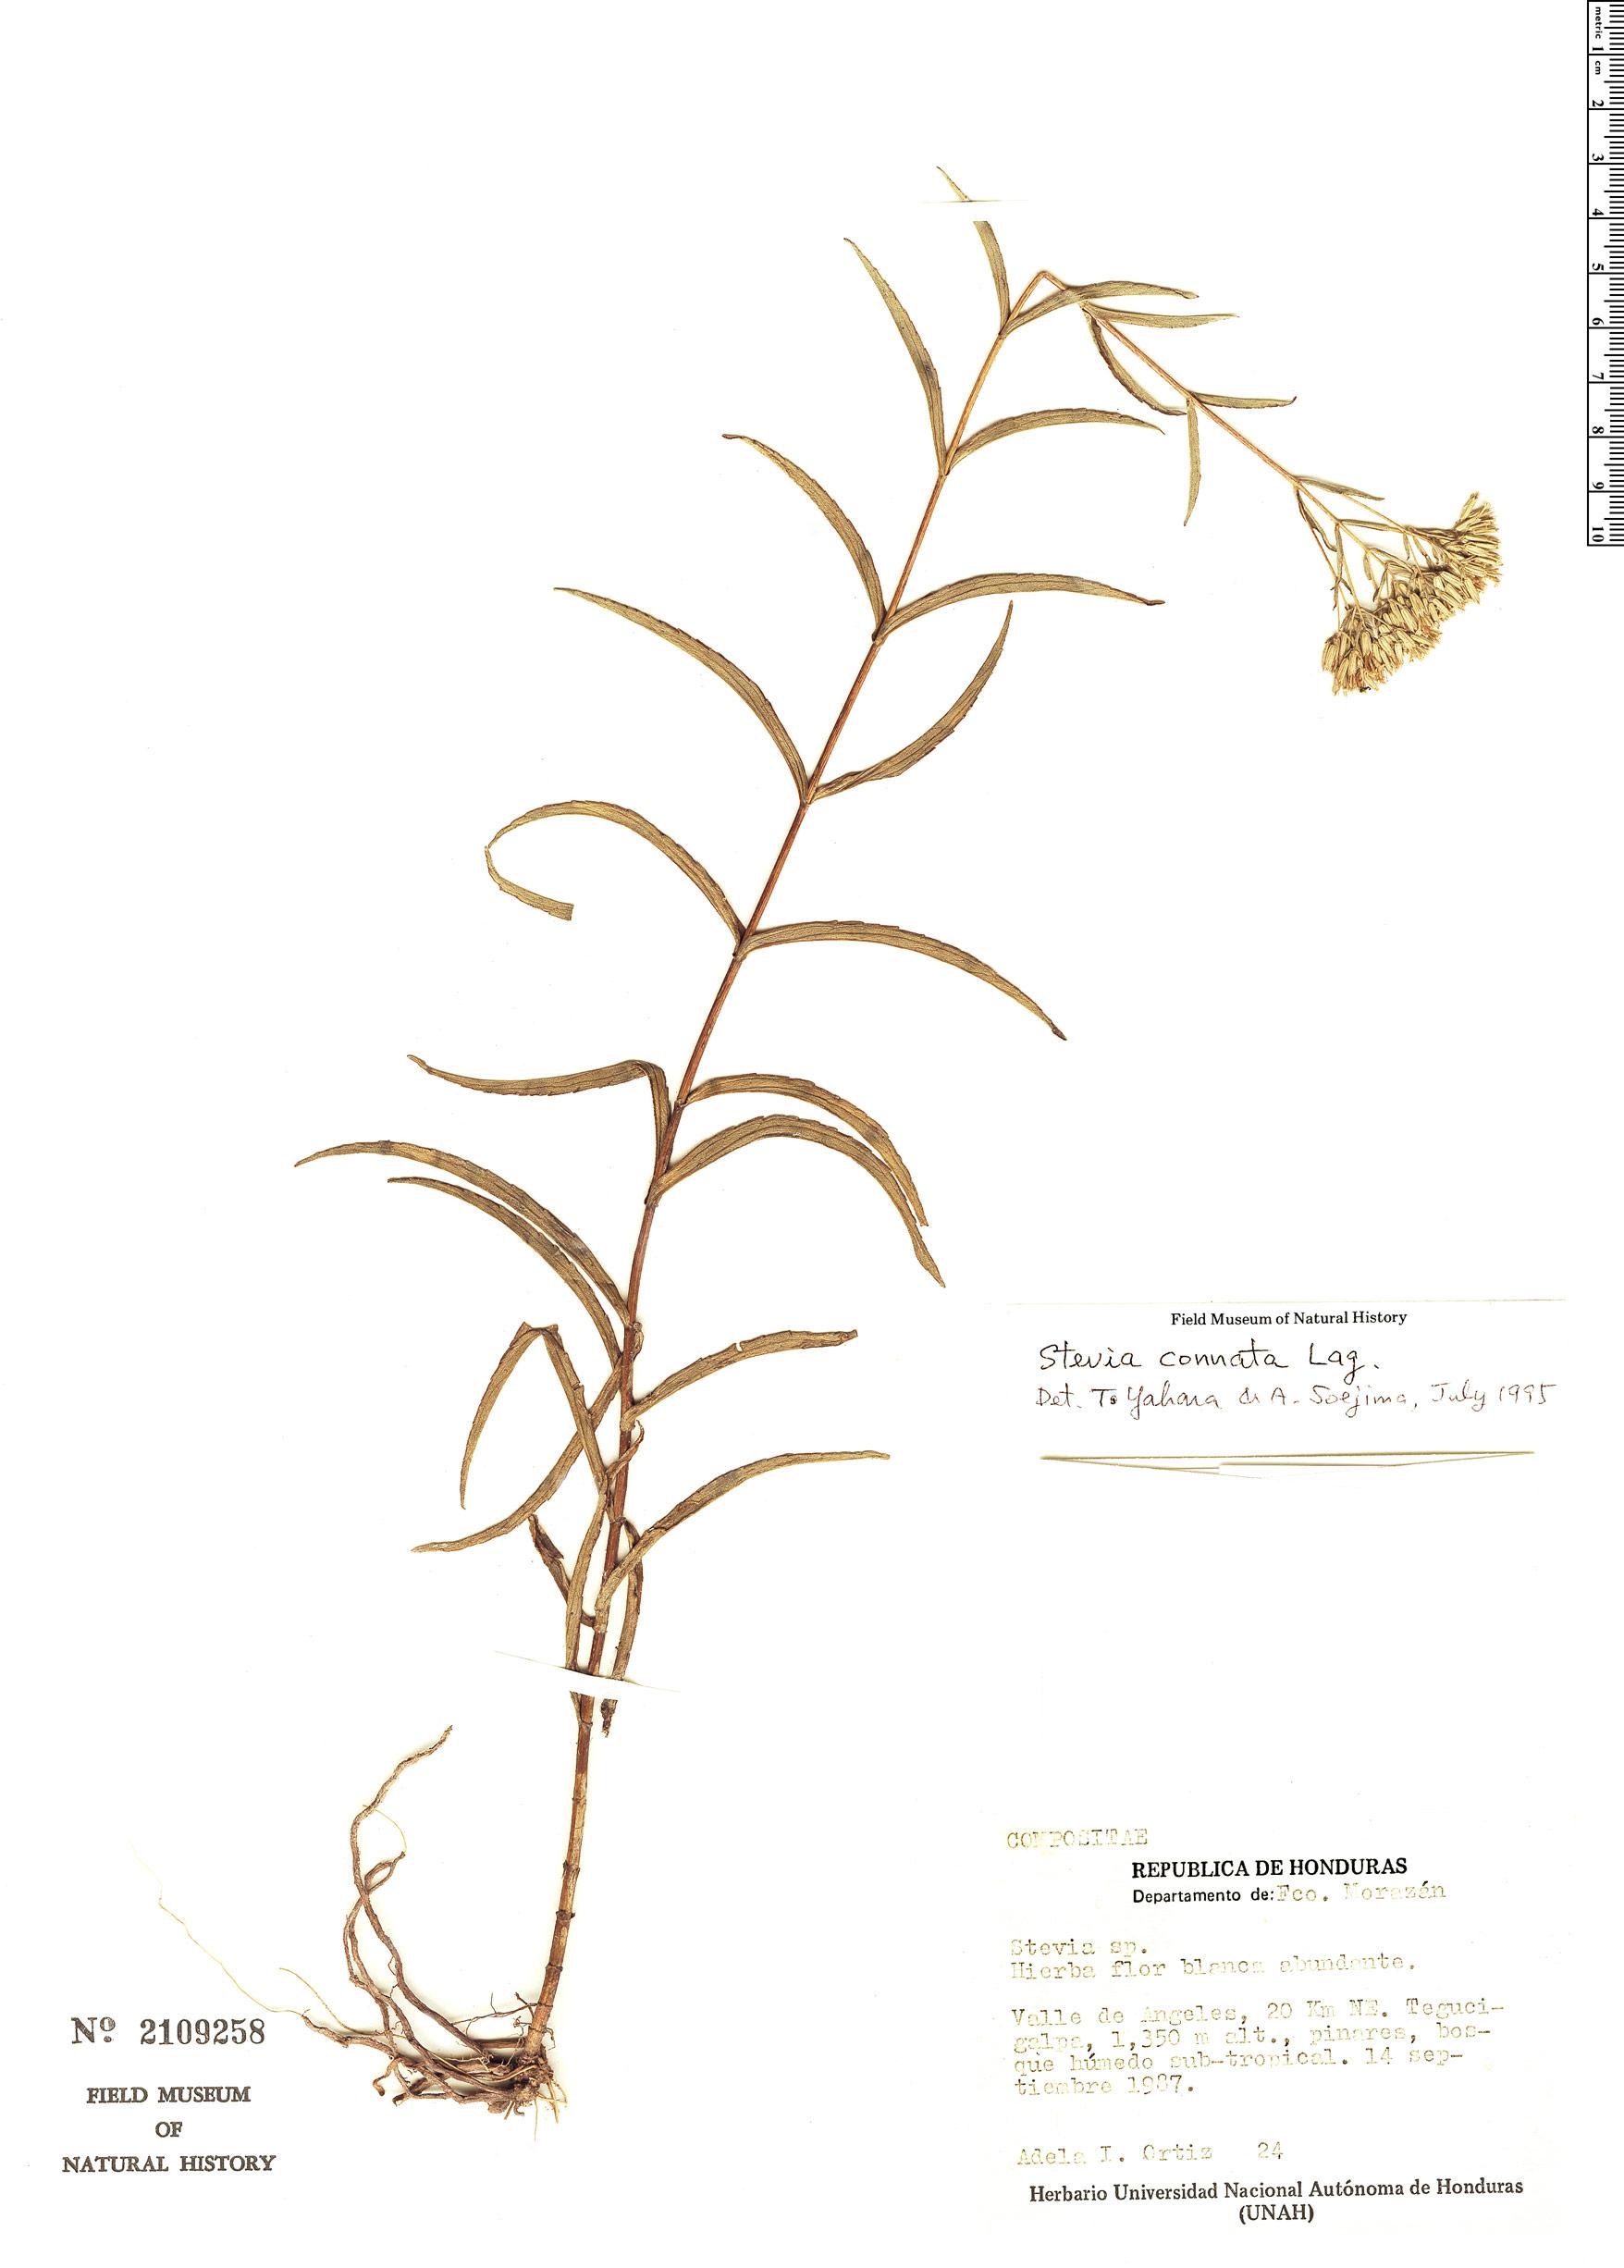 Specimen: Stevia connata